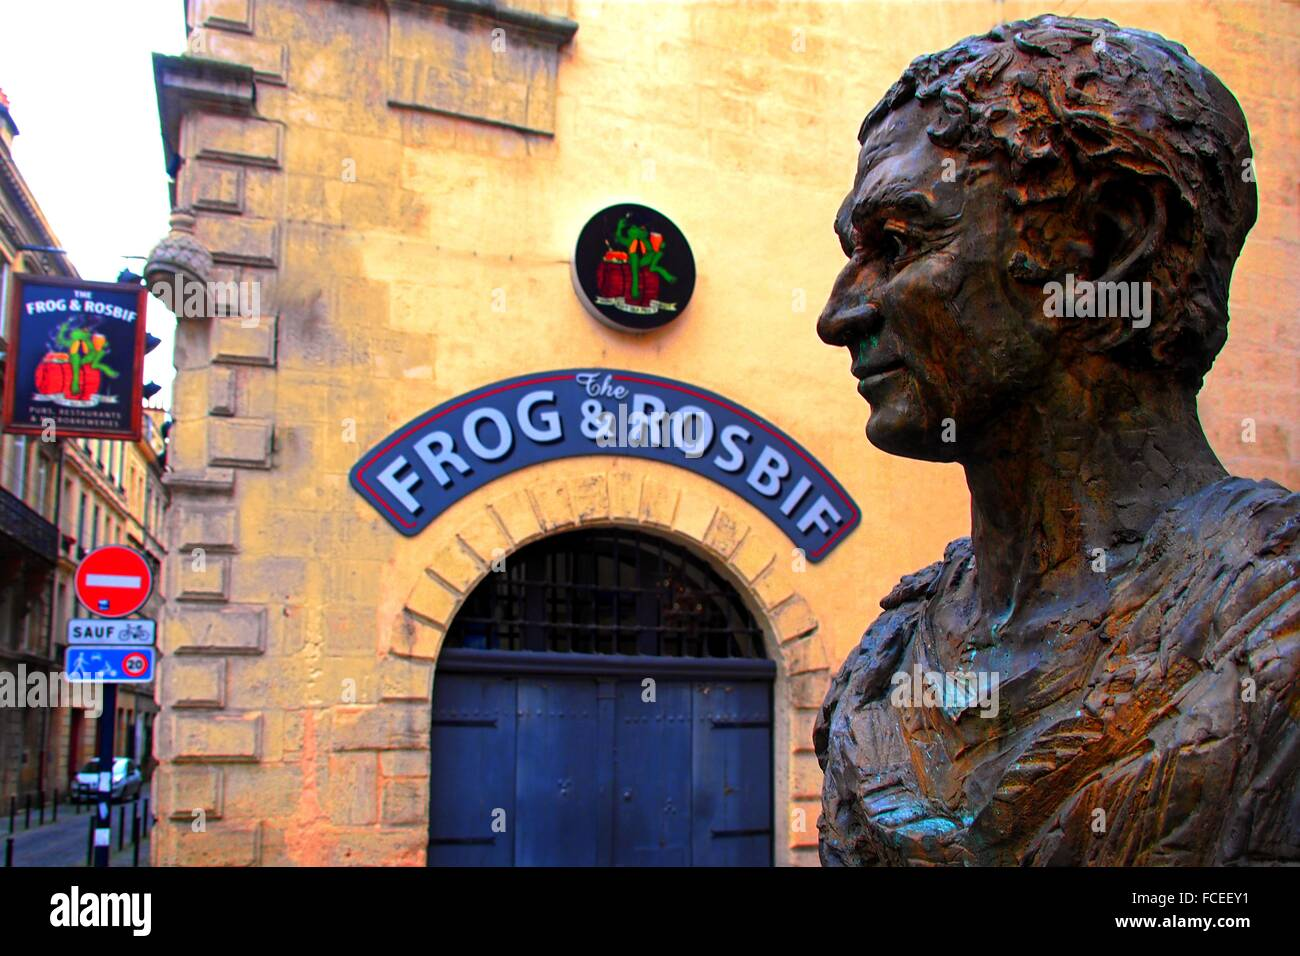 Statue of the Roman poet Ausonius and English pub sign on